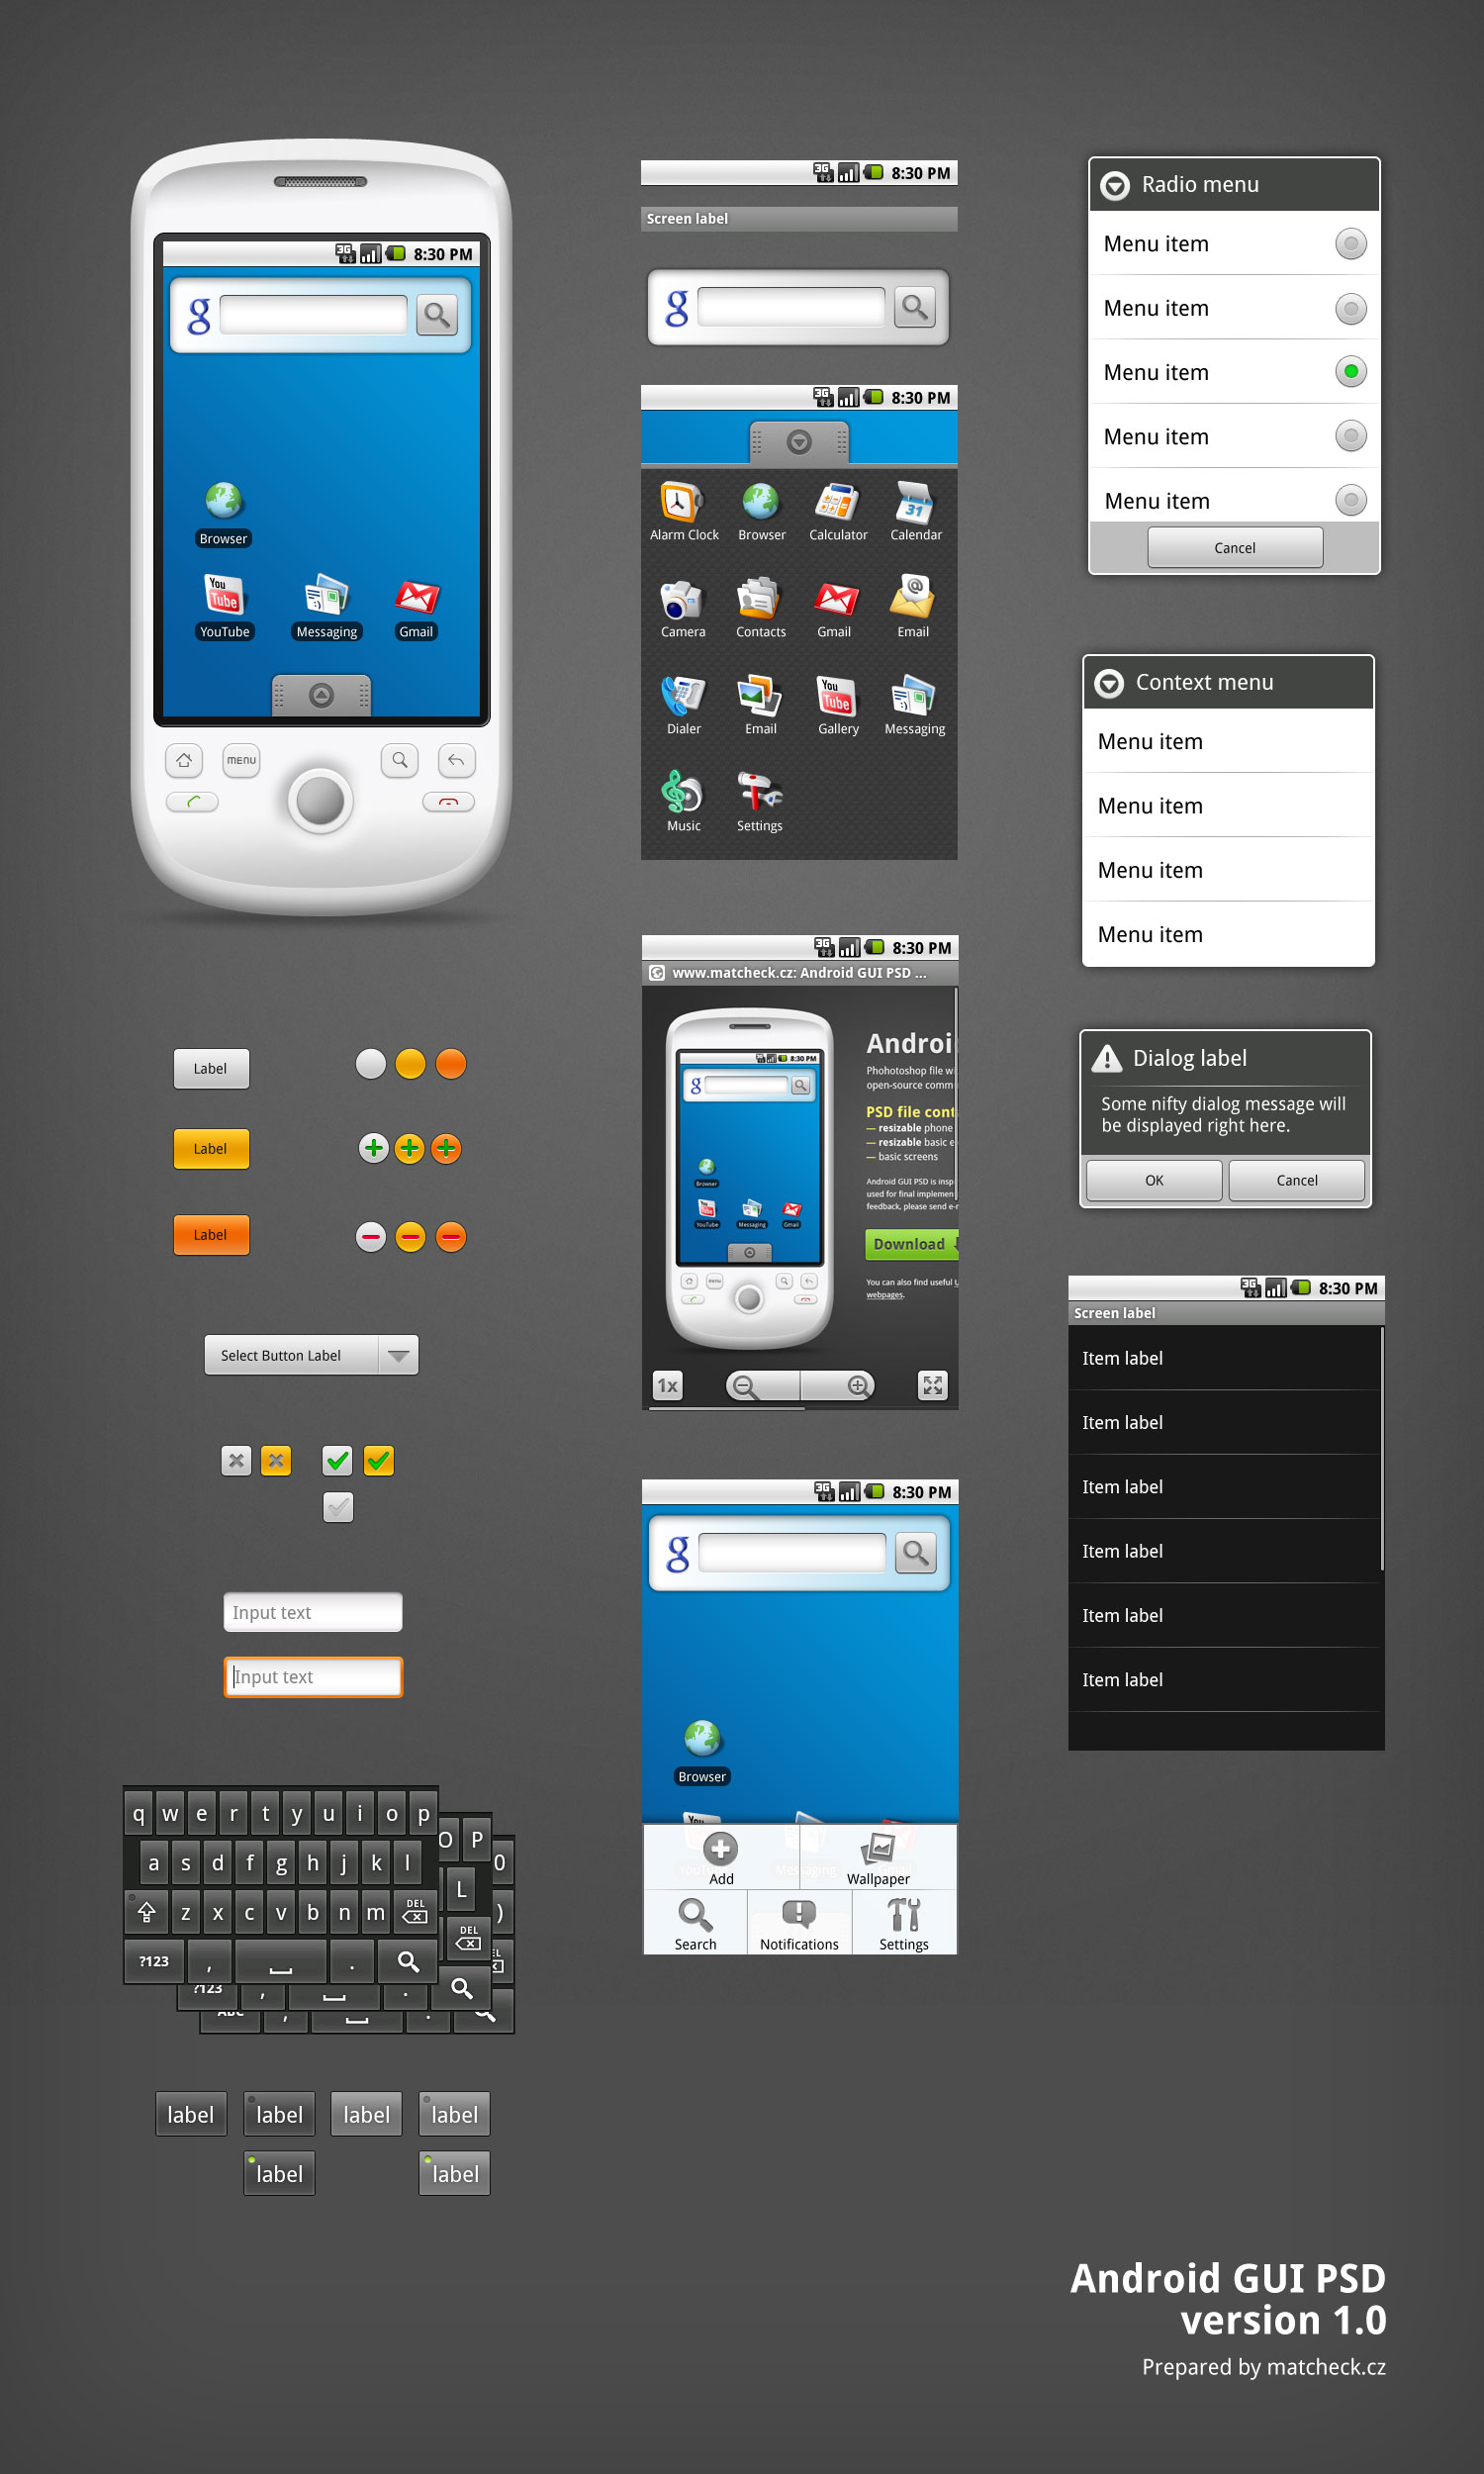 Android gui psd vector kit smashing magazine android gui psd maxwellsz